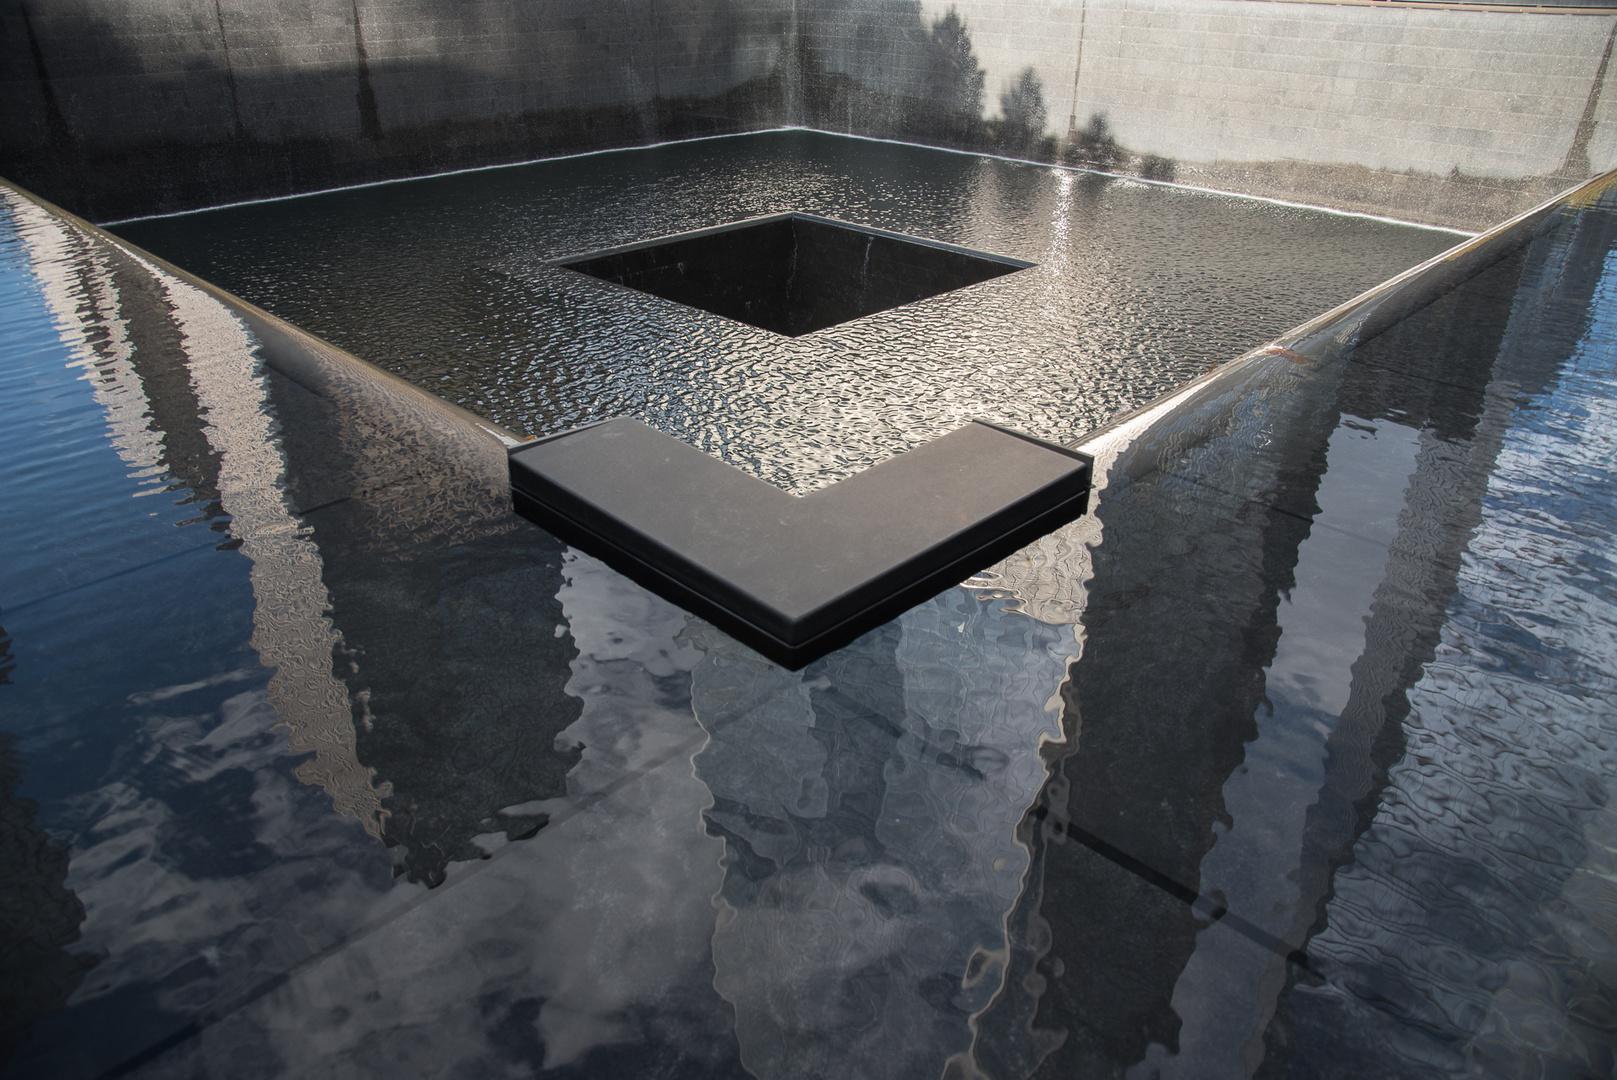 Blick in die Tiefe - Ground Zero, New York